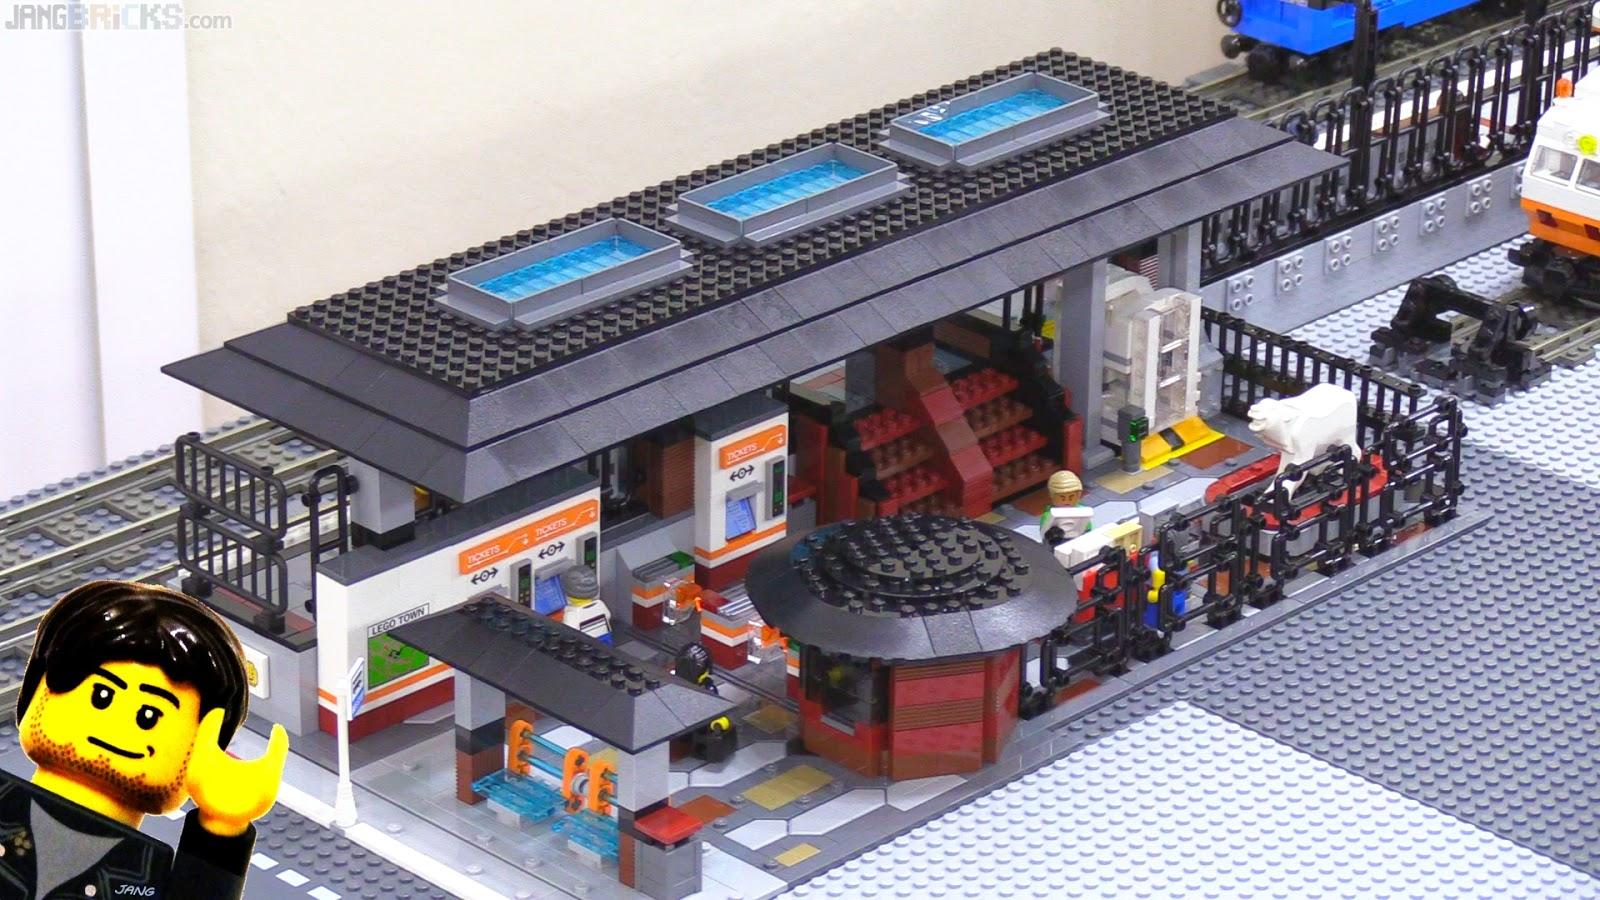 √ MOC of LEGO 60050 Train Station